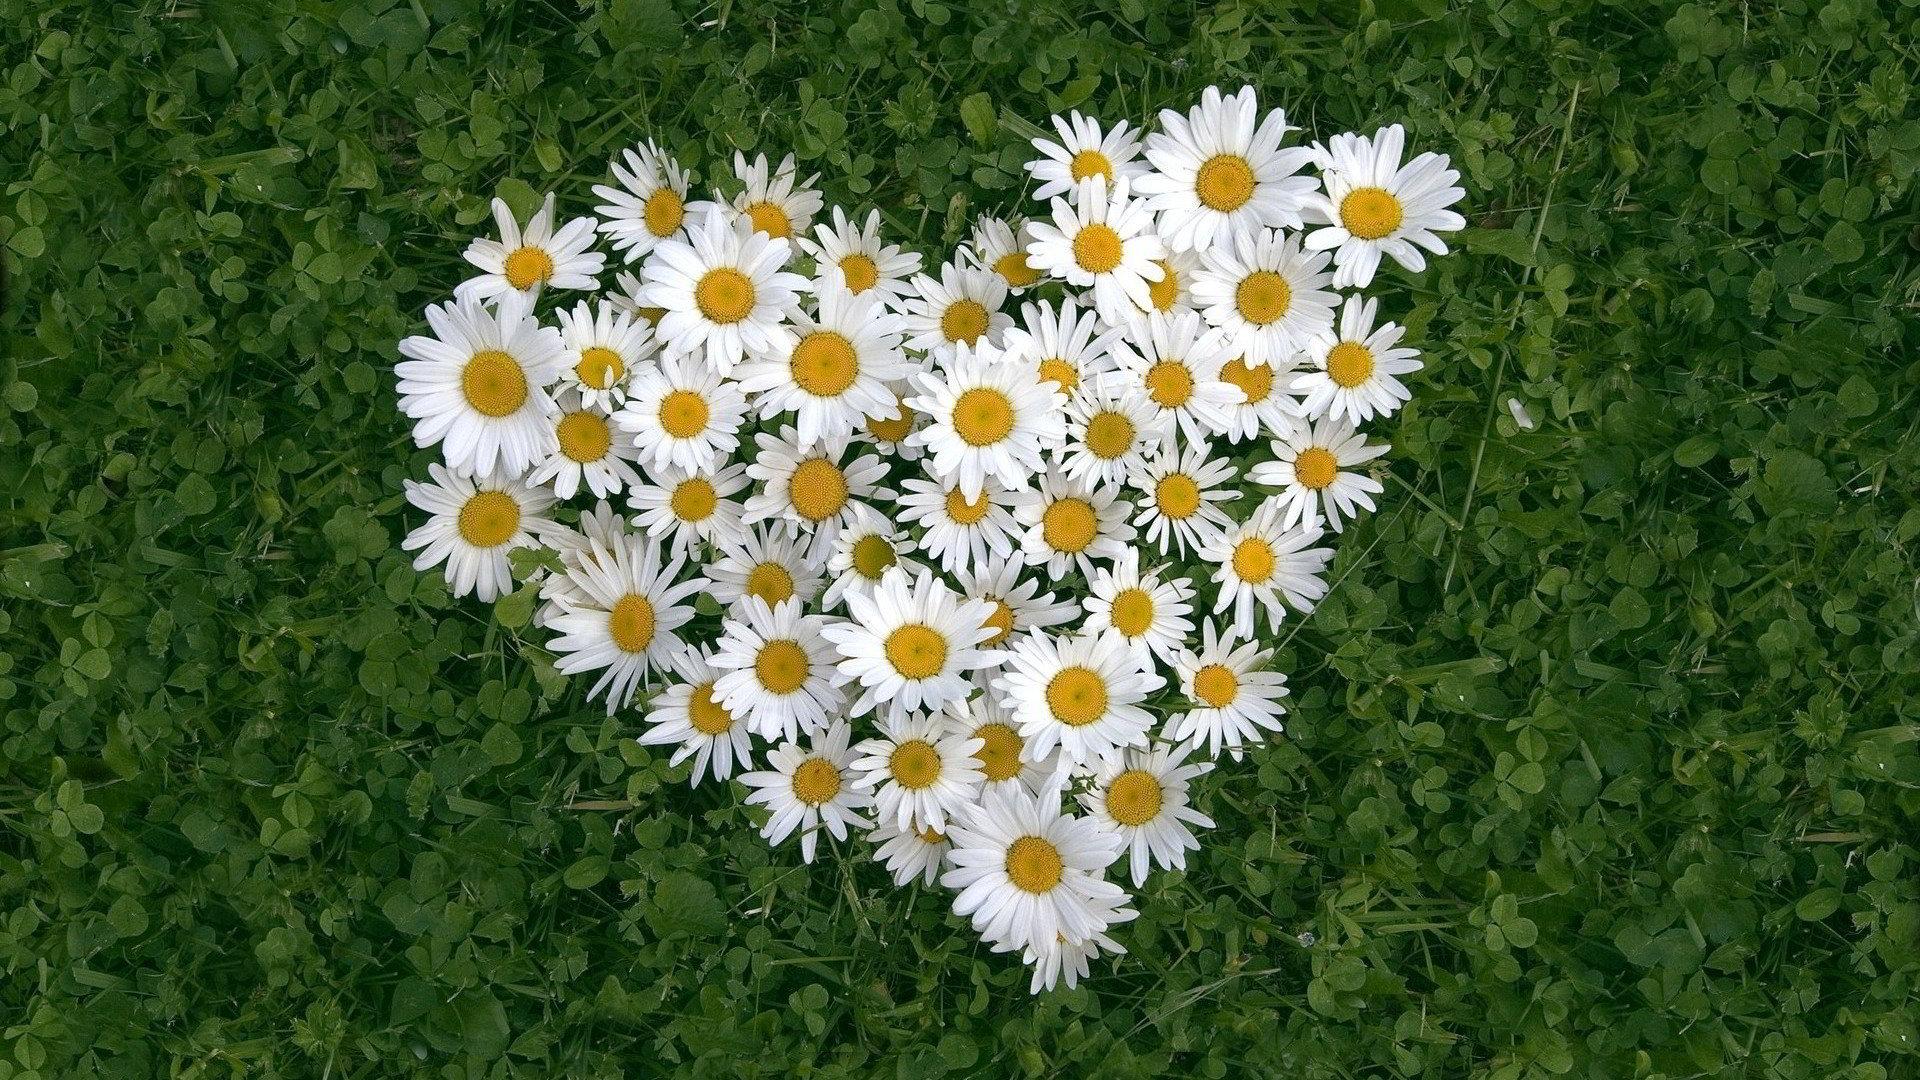 hinh anh hoa cuc dep 56